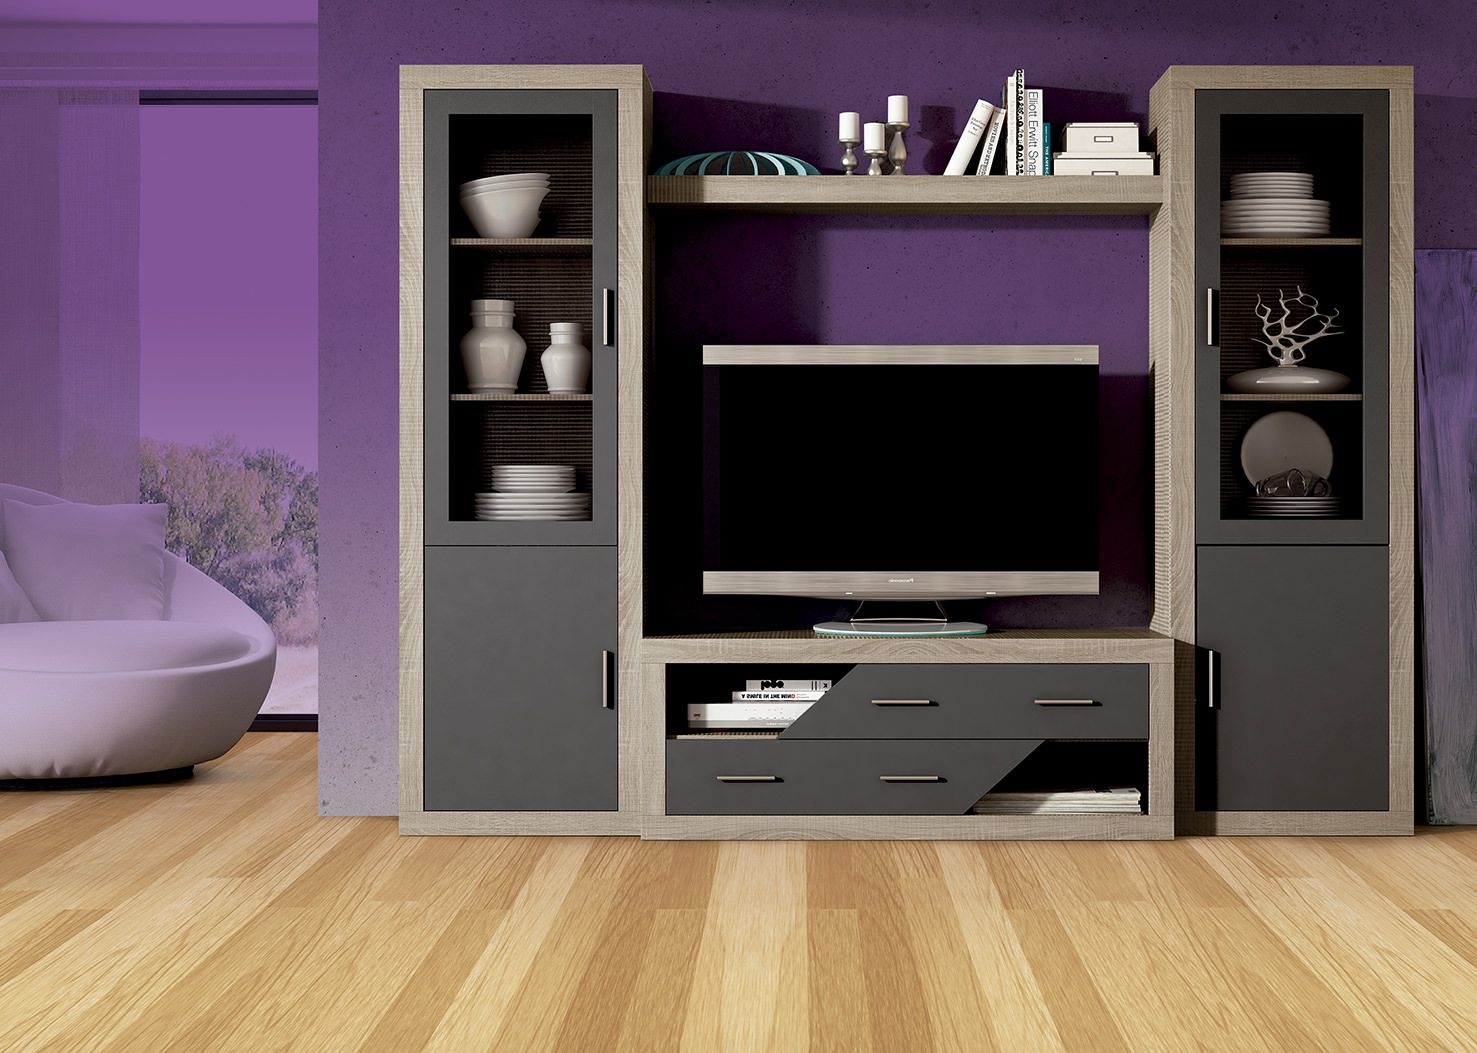 El mueble de comedor low cost laraga 06 - Muebles low cost ...